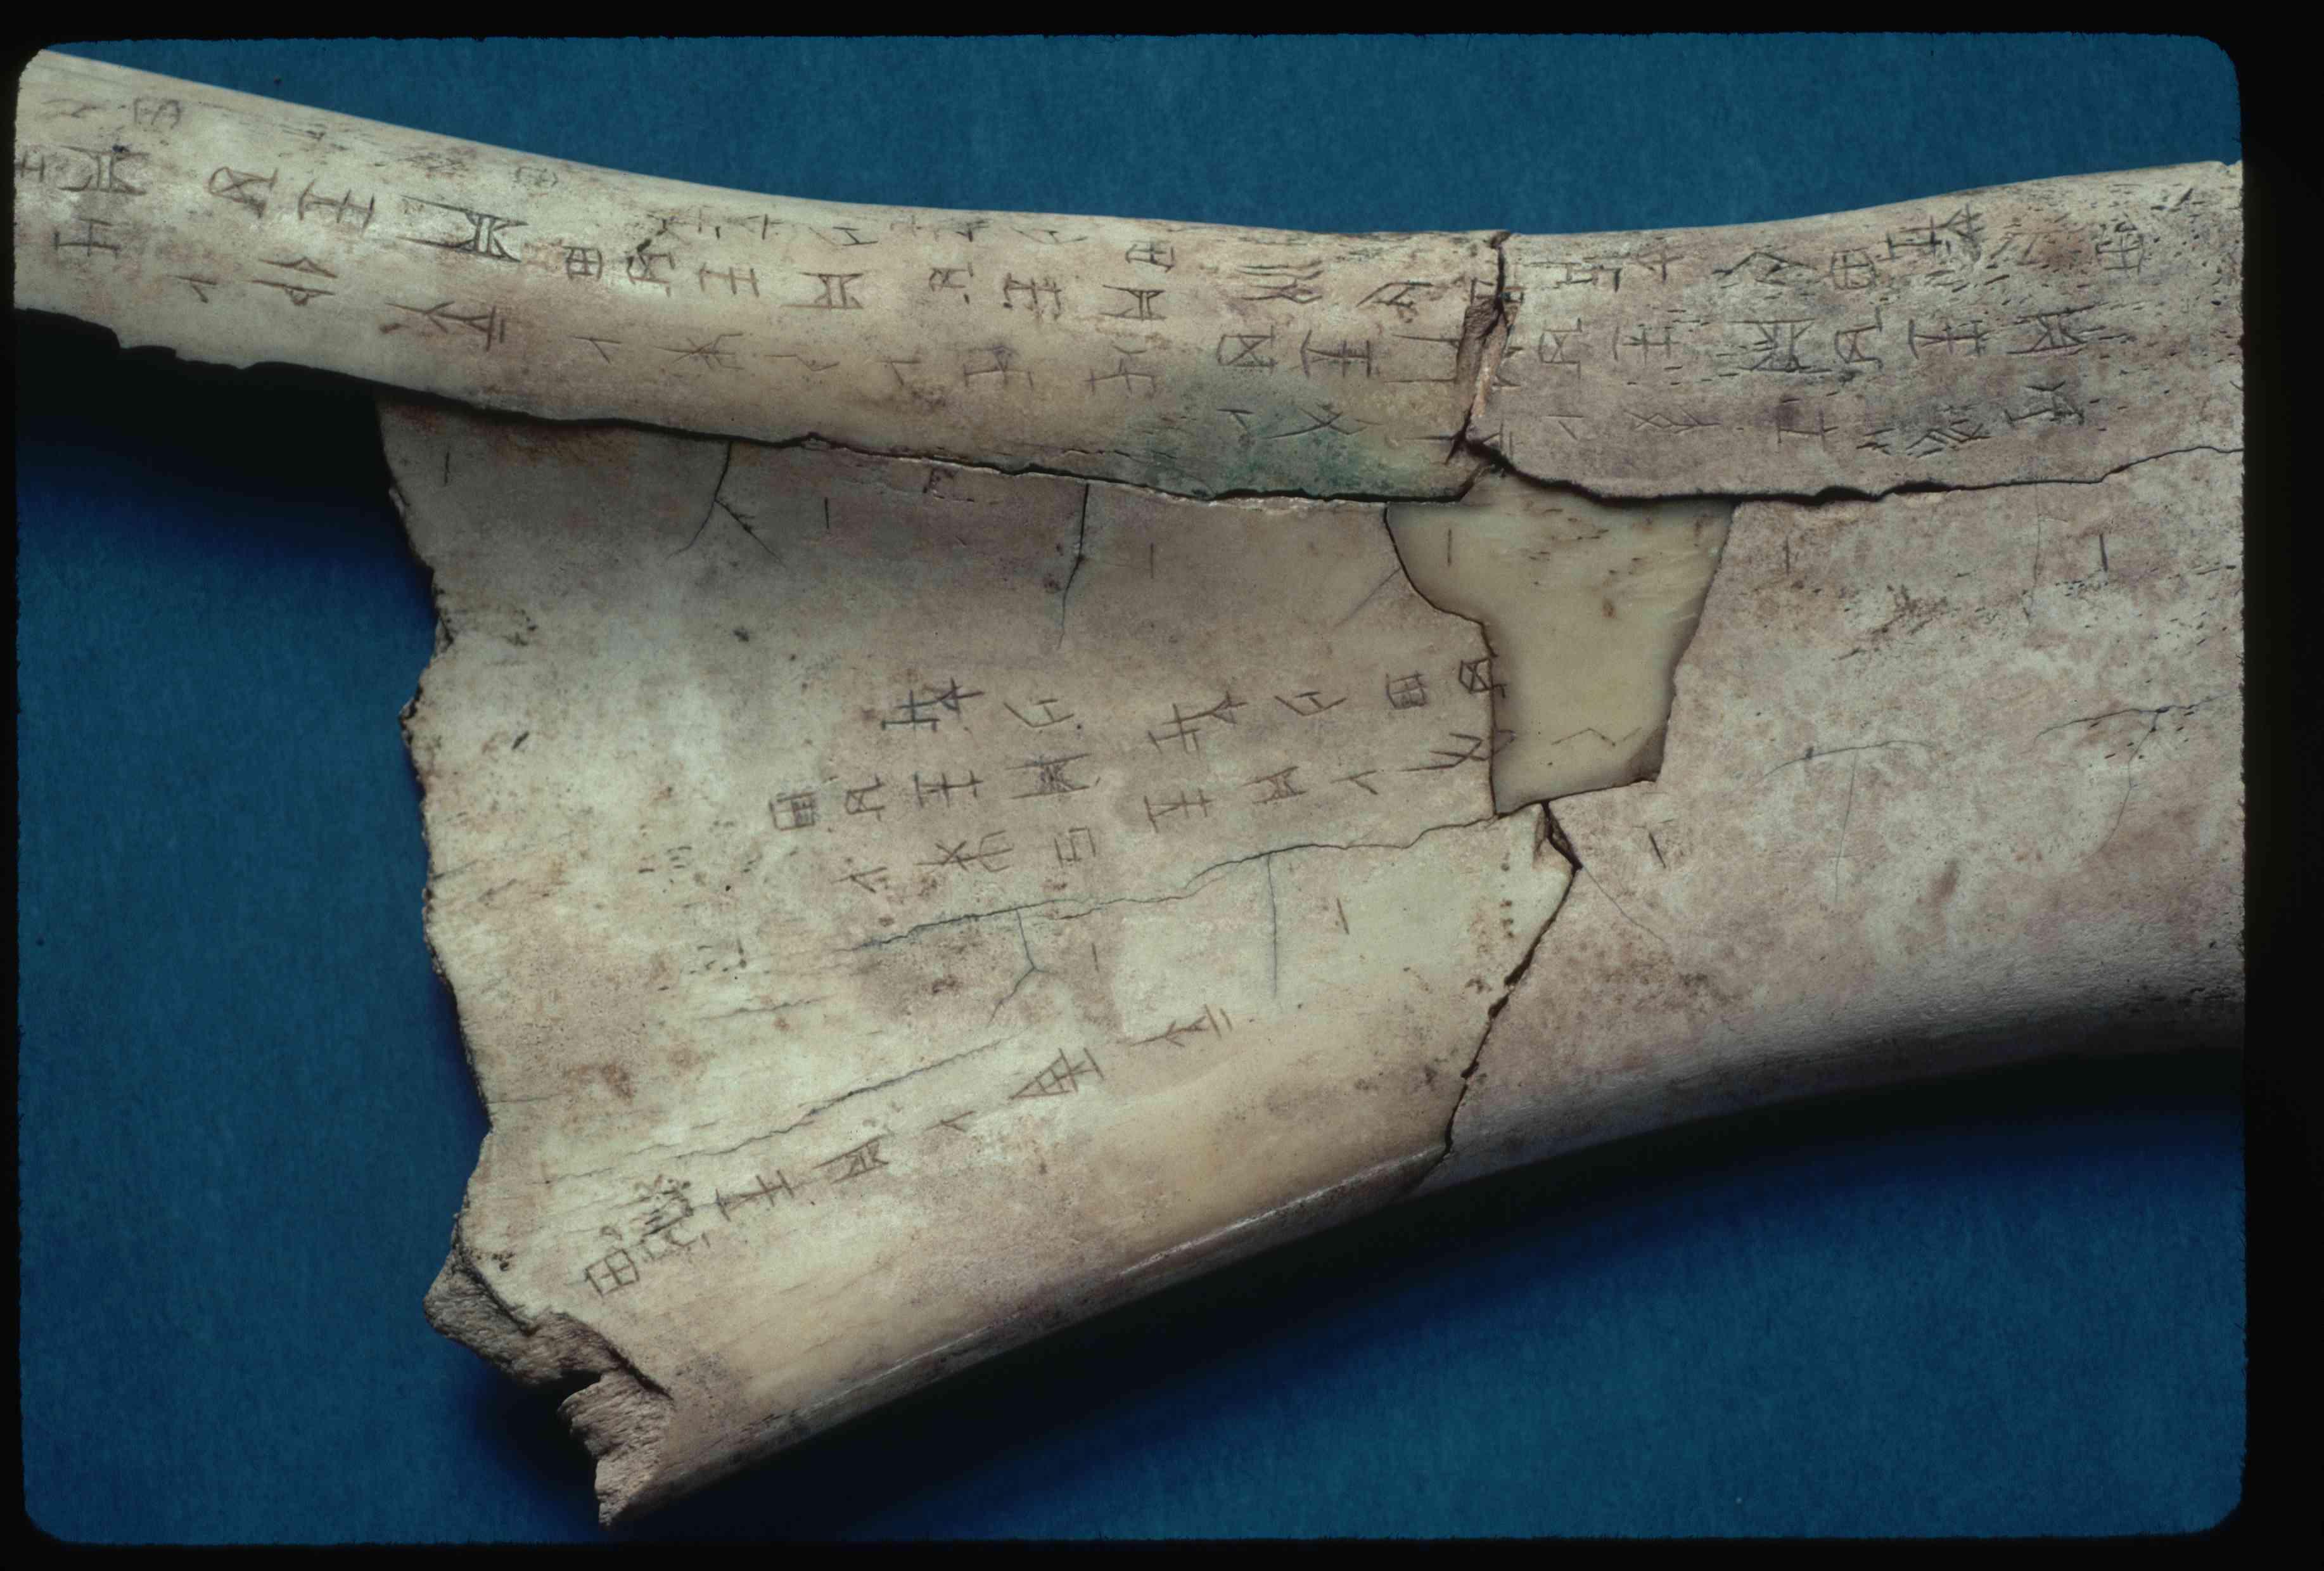 Shang Dynasty Oracle Bone